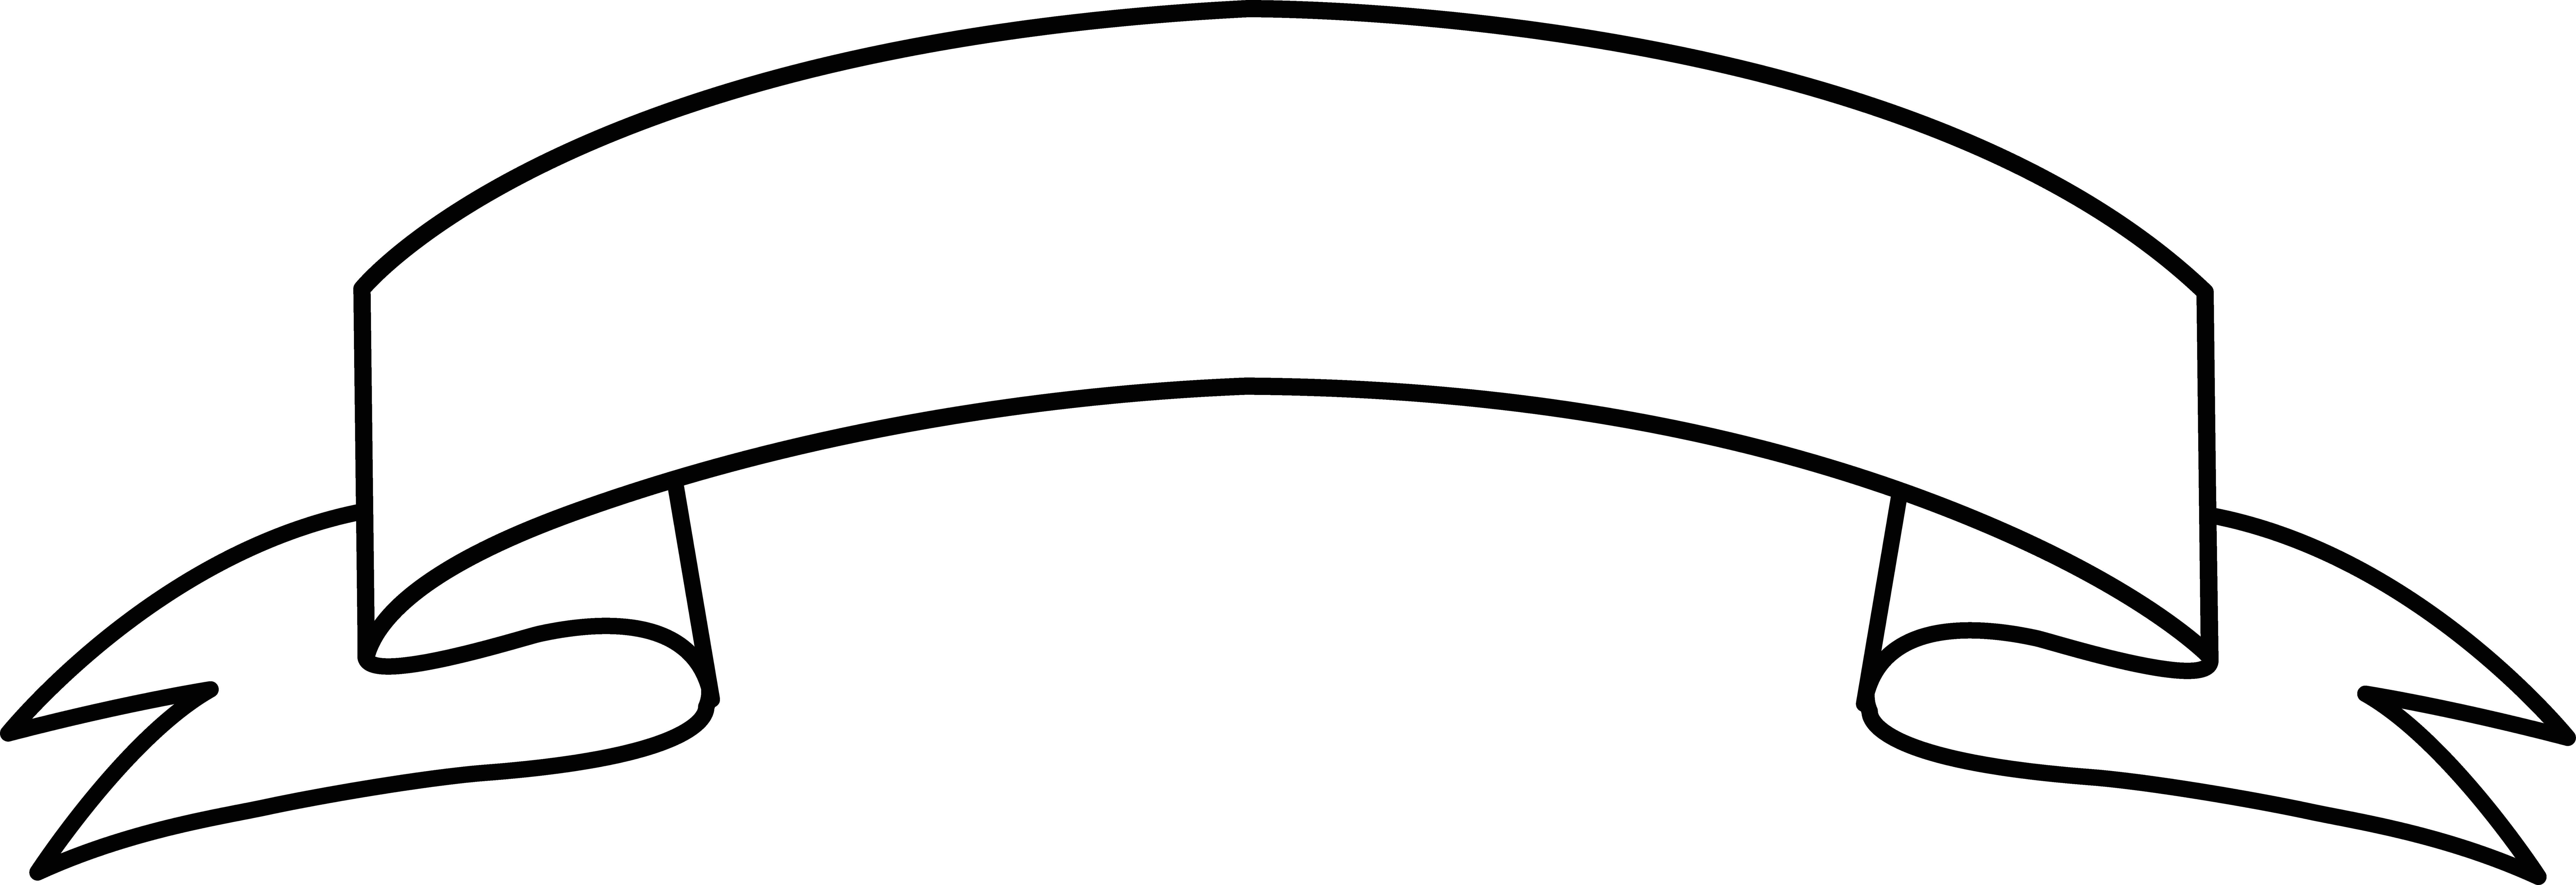 11201x3847 Vector Clipart Banner